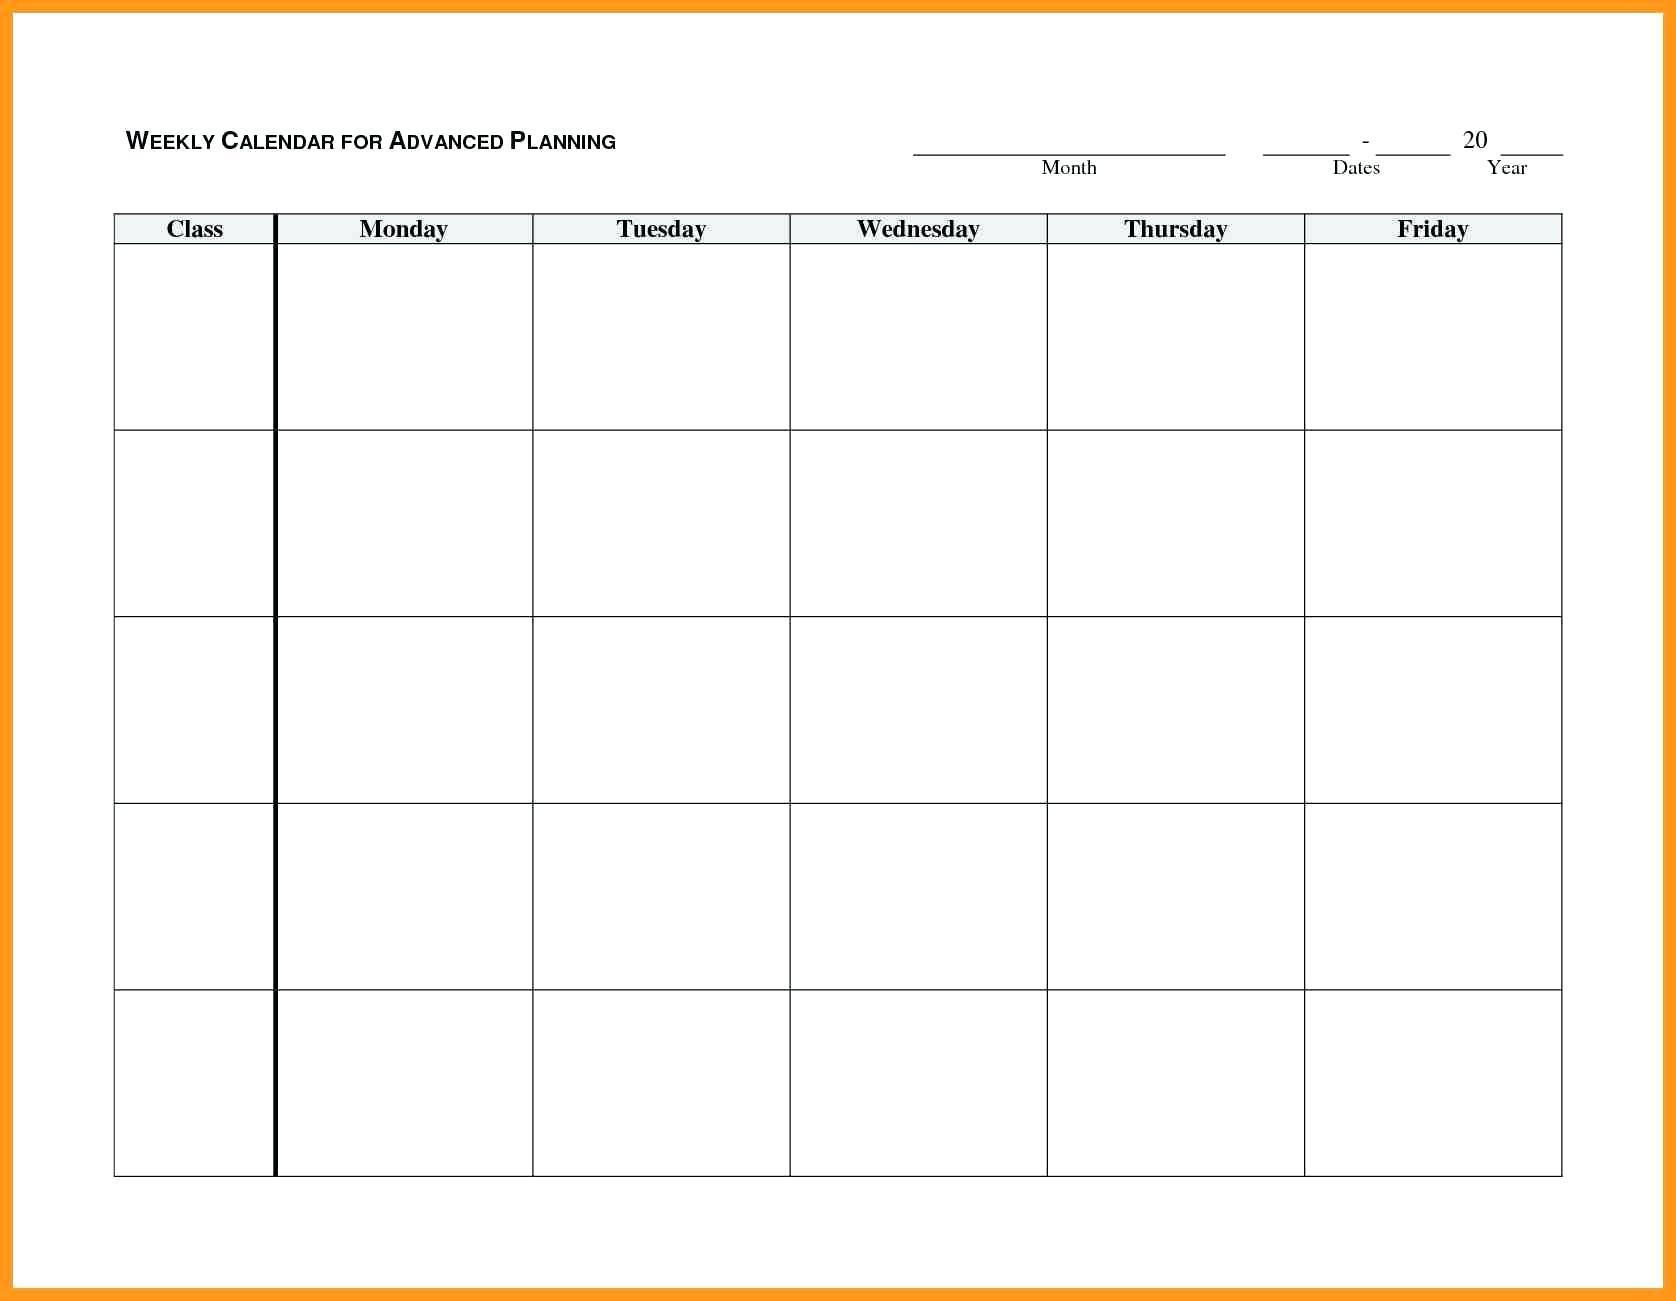 Blank Weekly Ndar Monday Through Friday Template Word Free